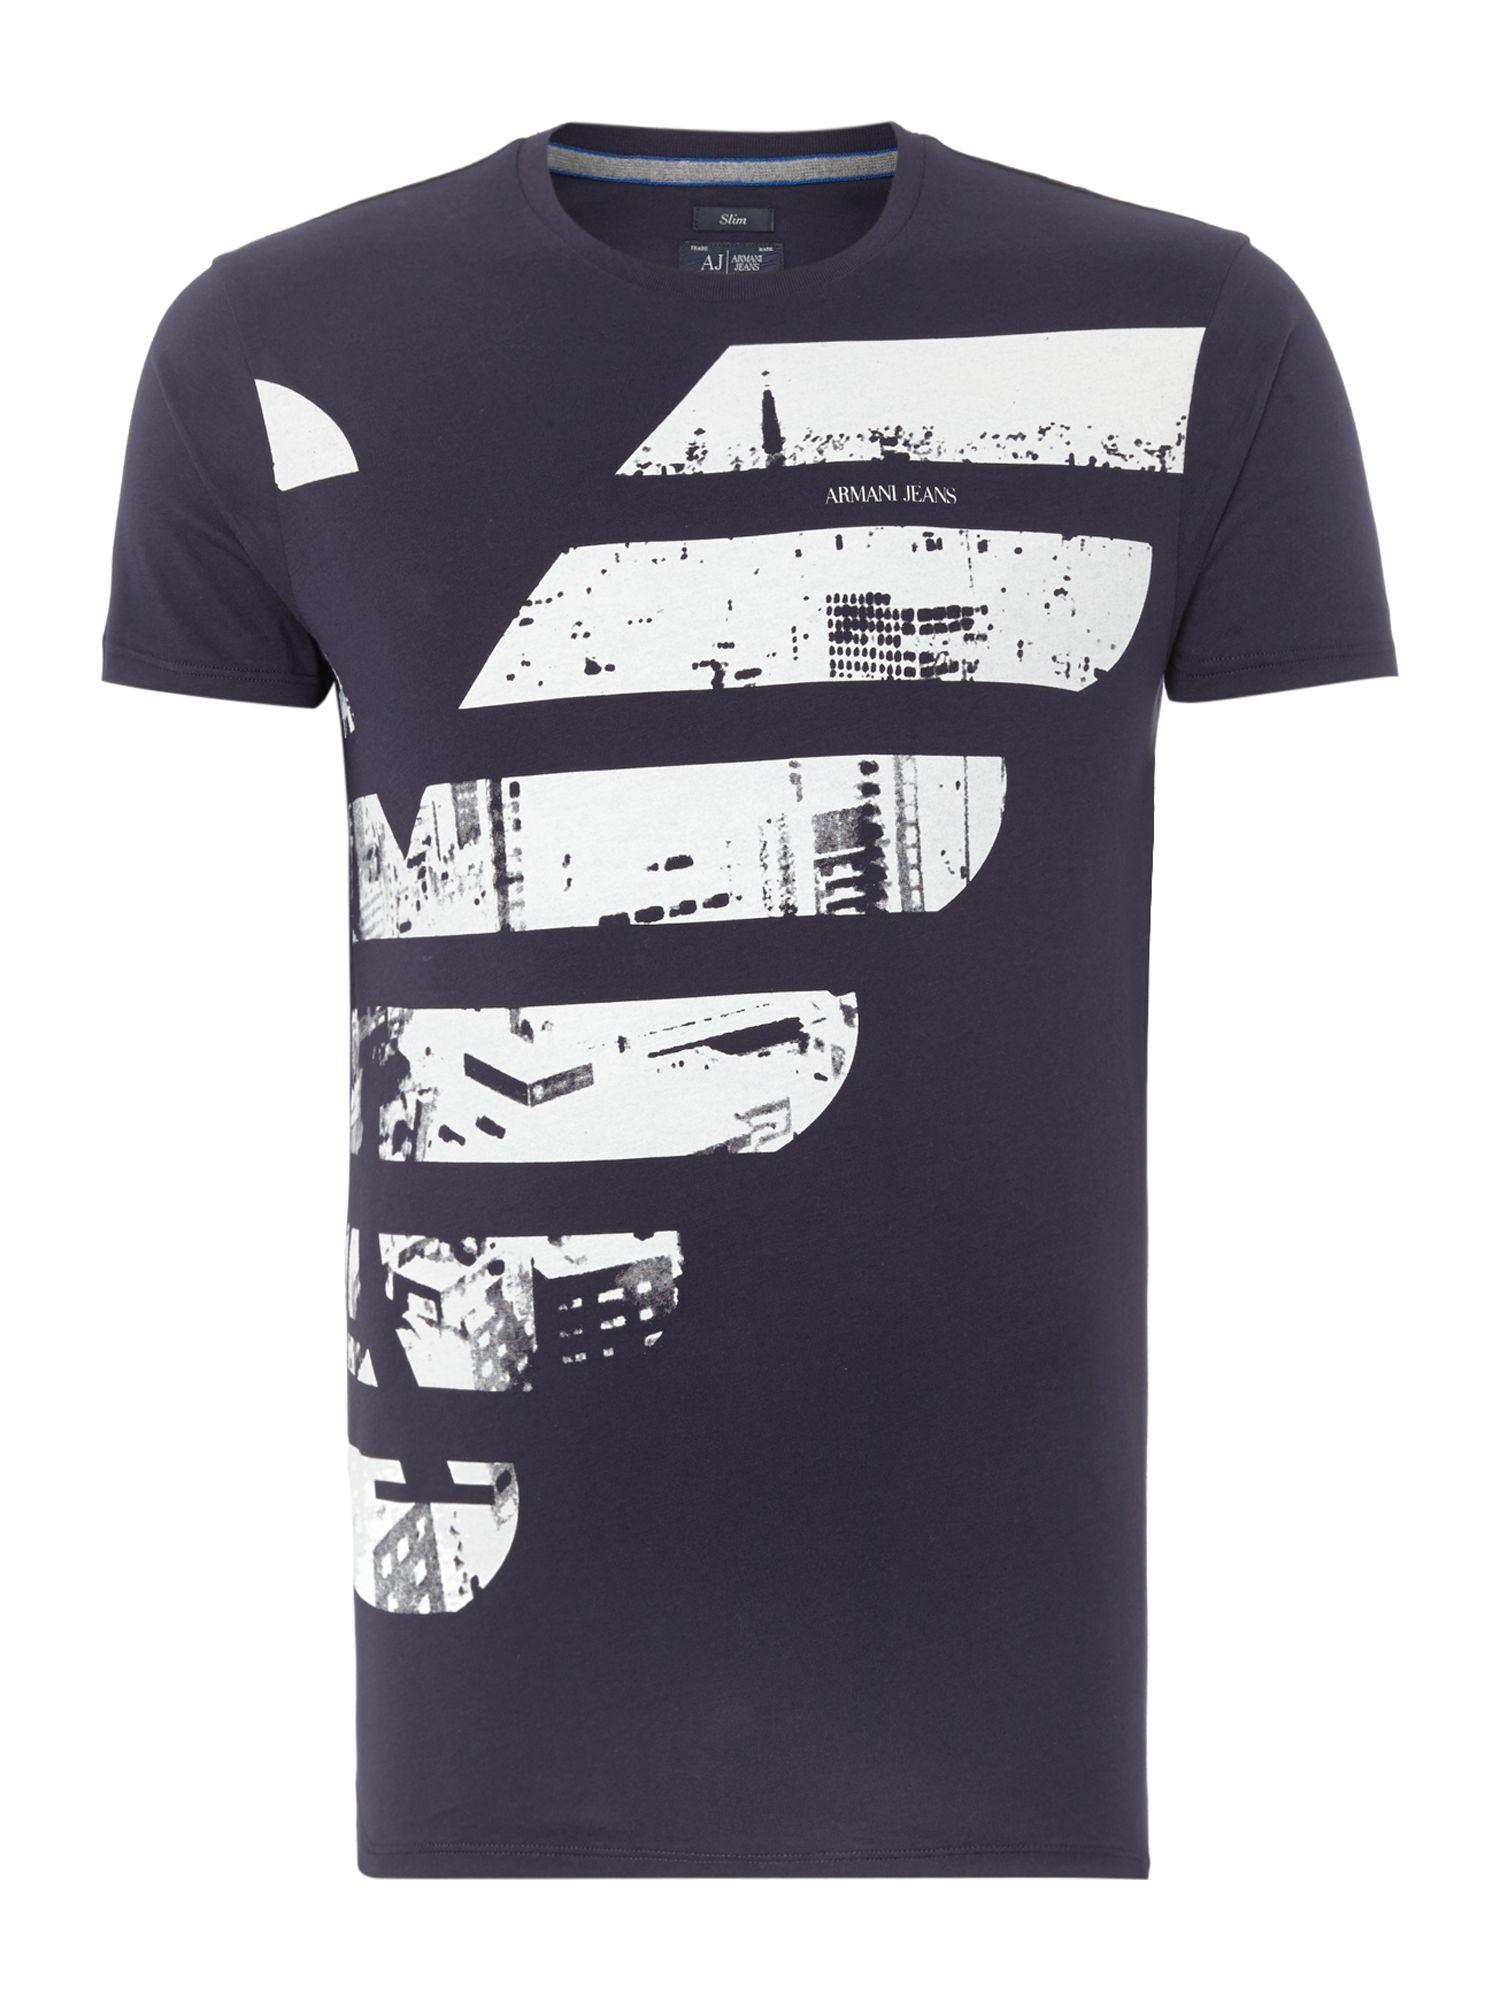 armani jeans slim fit half eagle logo printed t shirt in white for men lyst. Black Bedroom Furniture Sets. Home Design Ideas